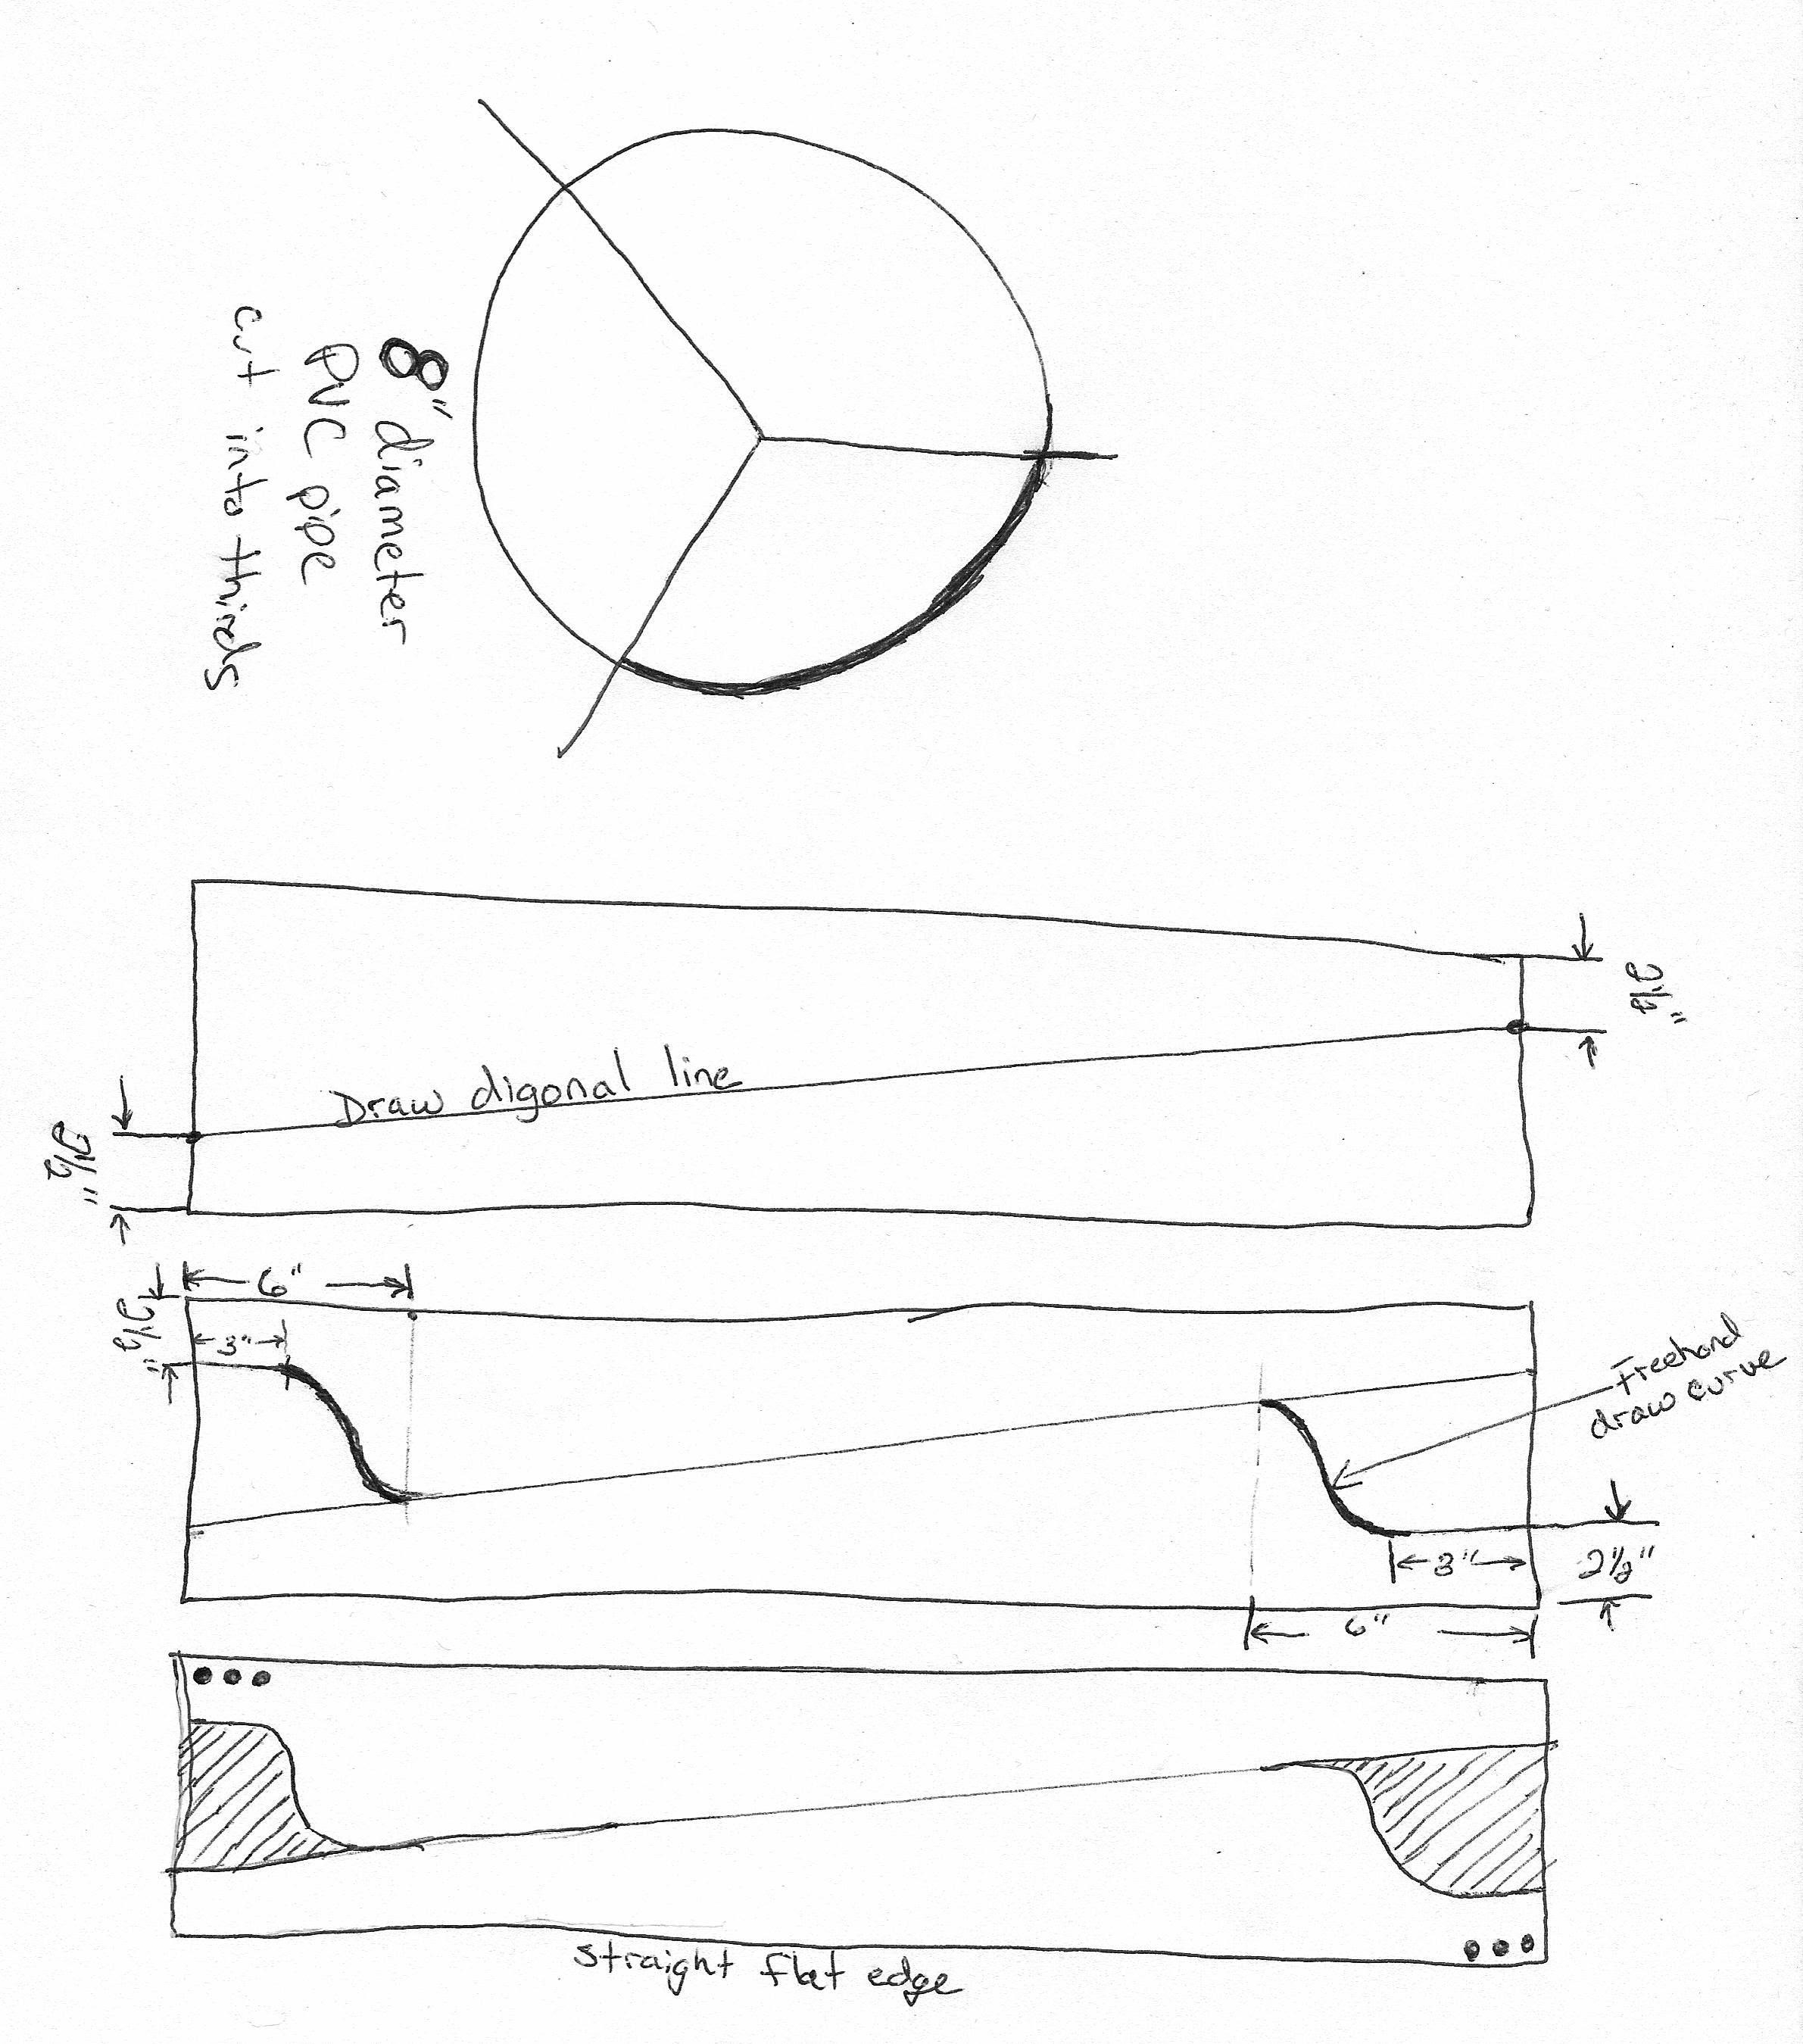 Jib Energy: Wind turbine blade design drawing Guide